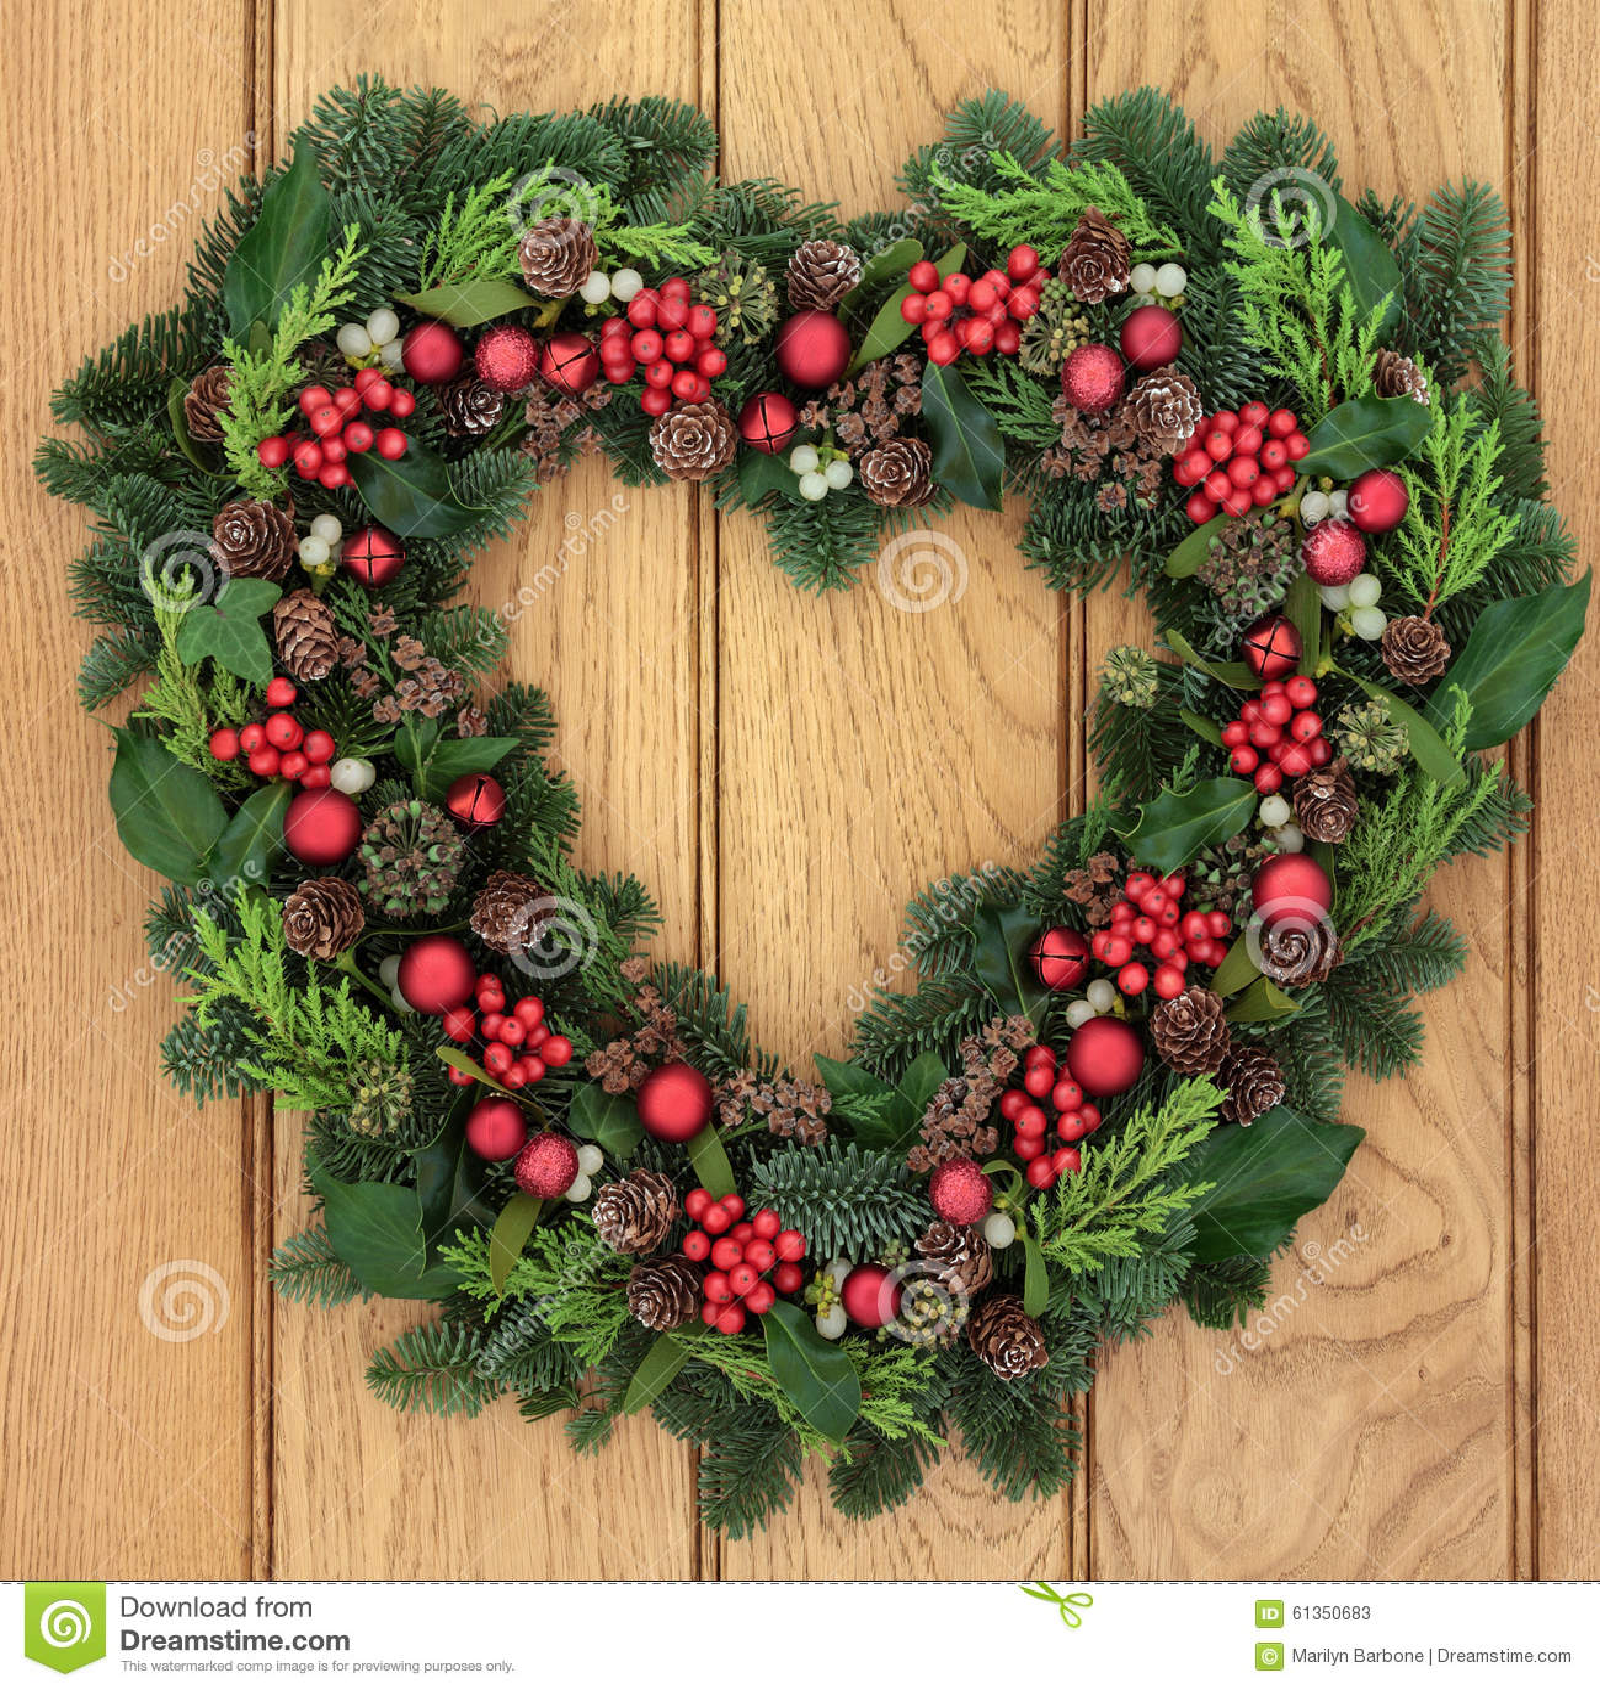 Christmas Wreath Stock Photo - Image: 61350683